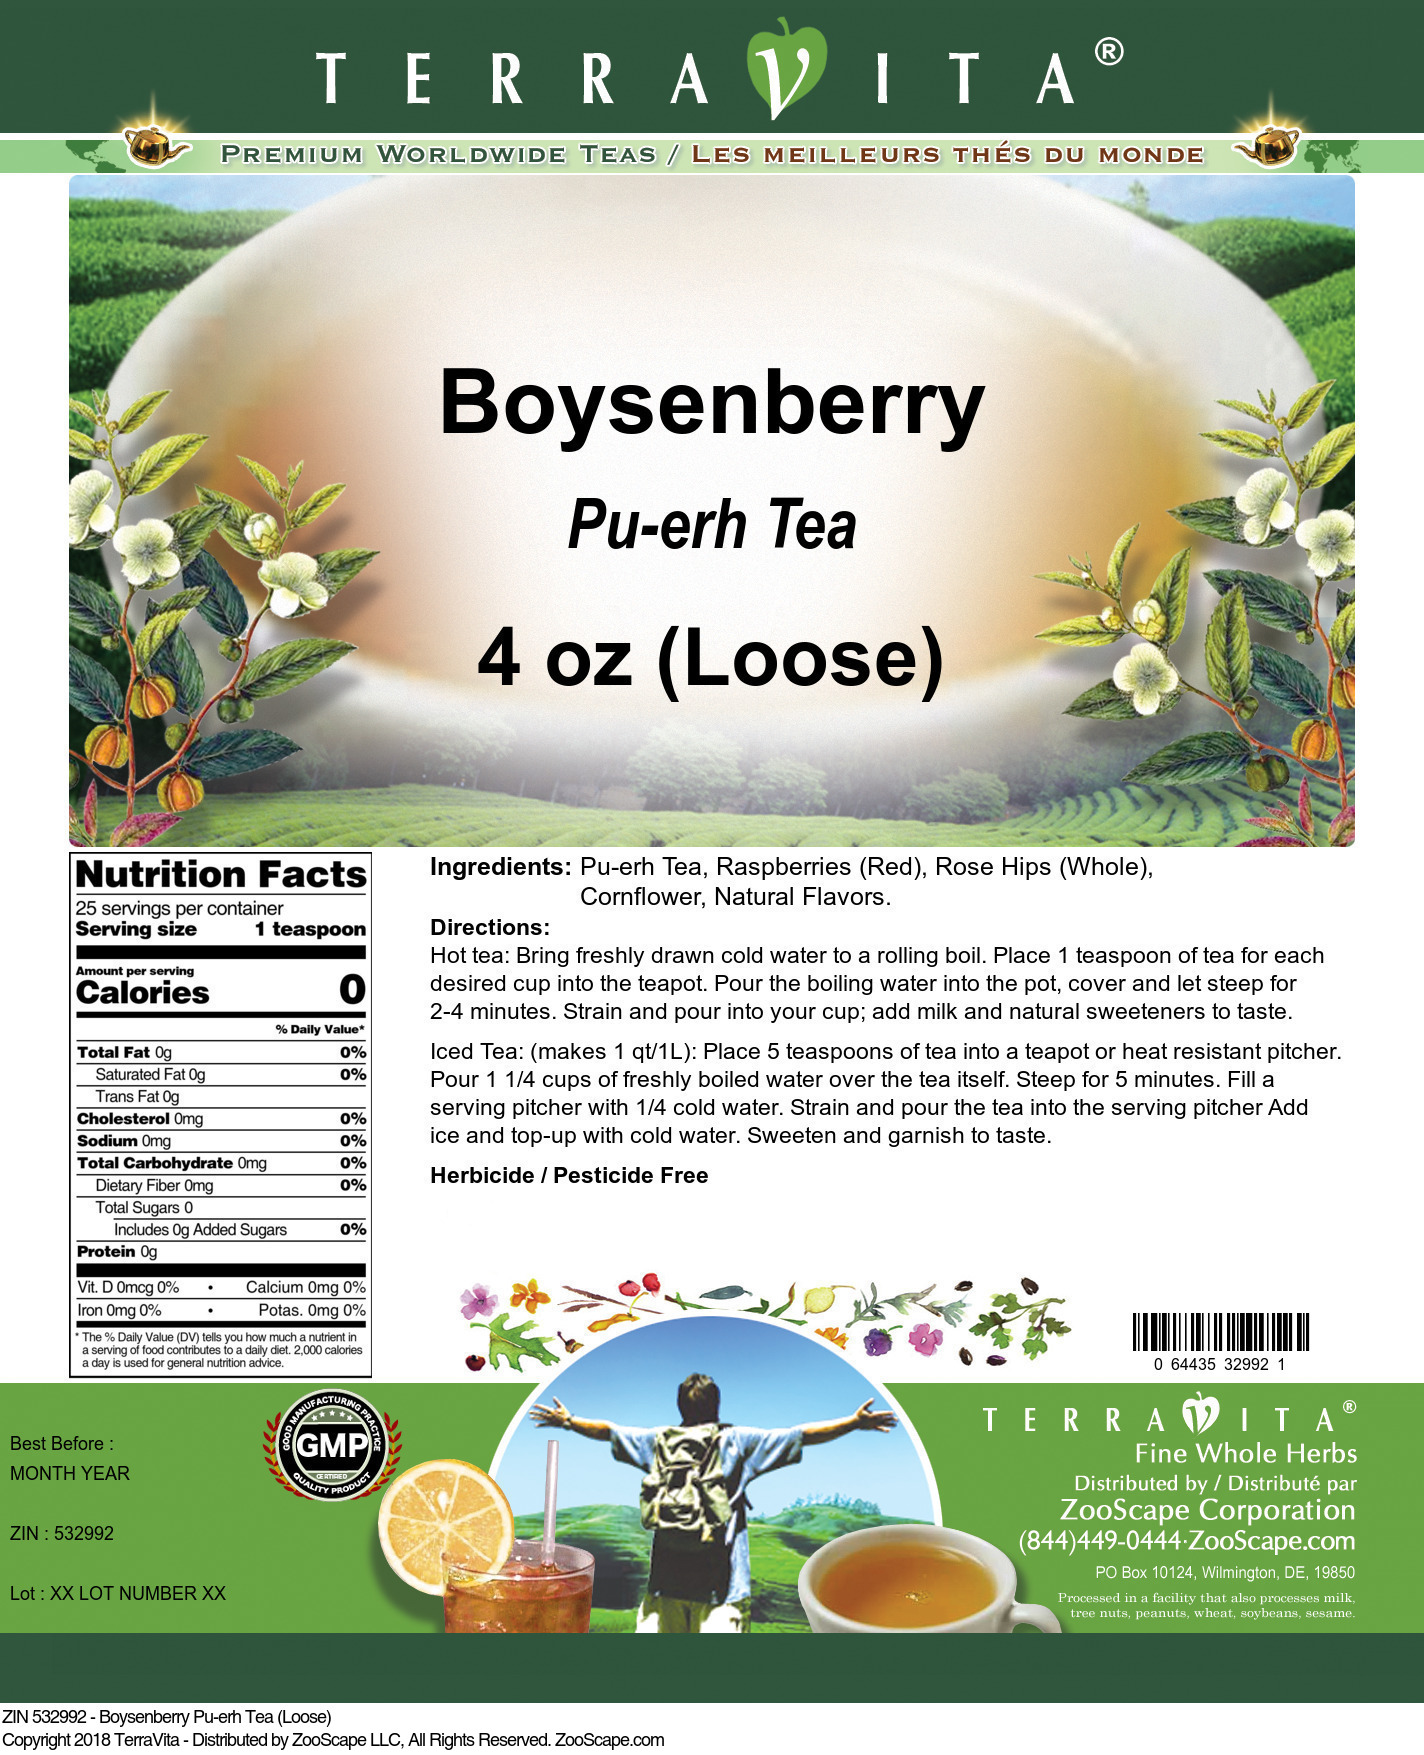 Boysenberry Pu-erh Tea